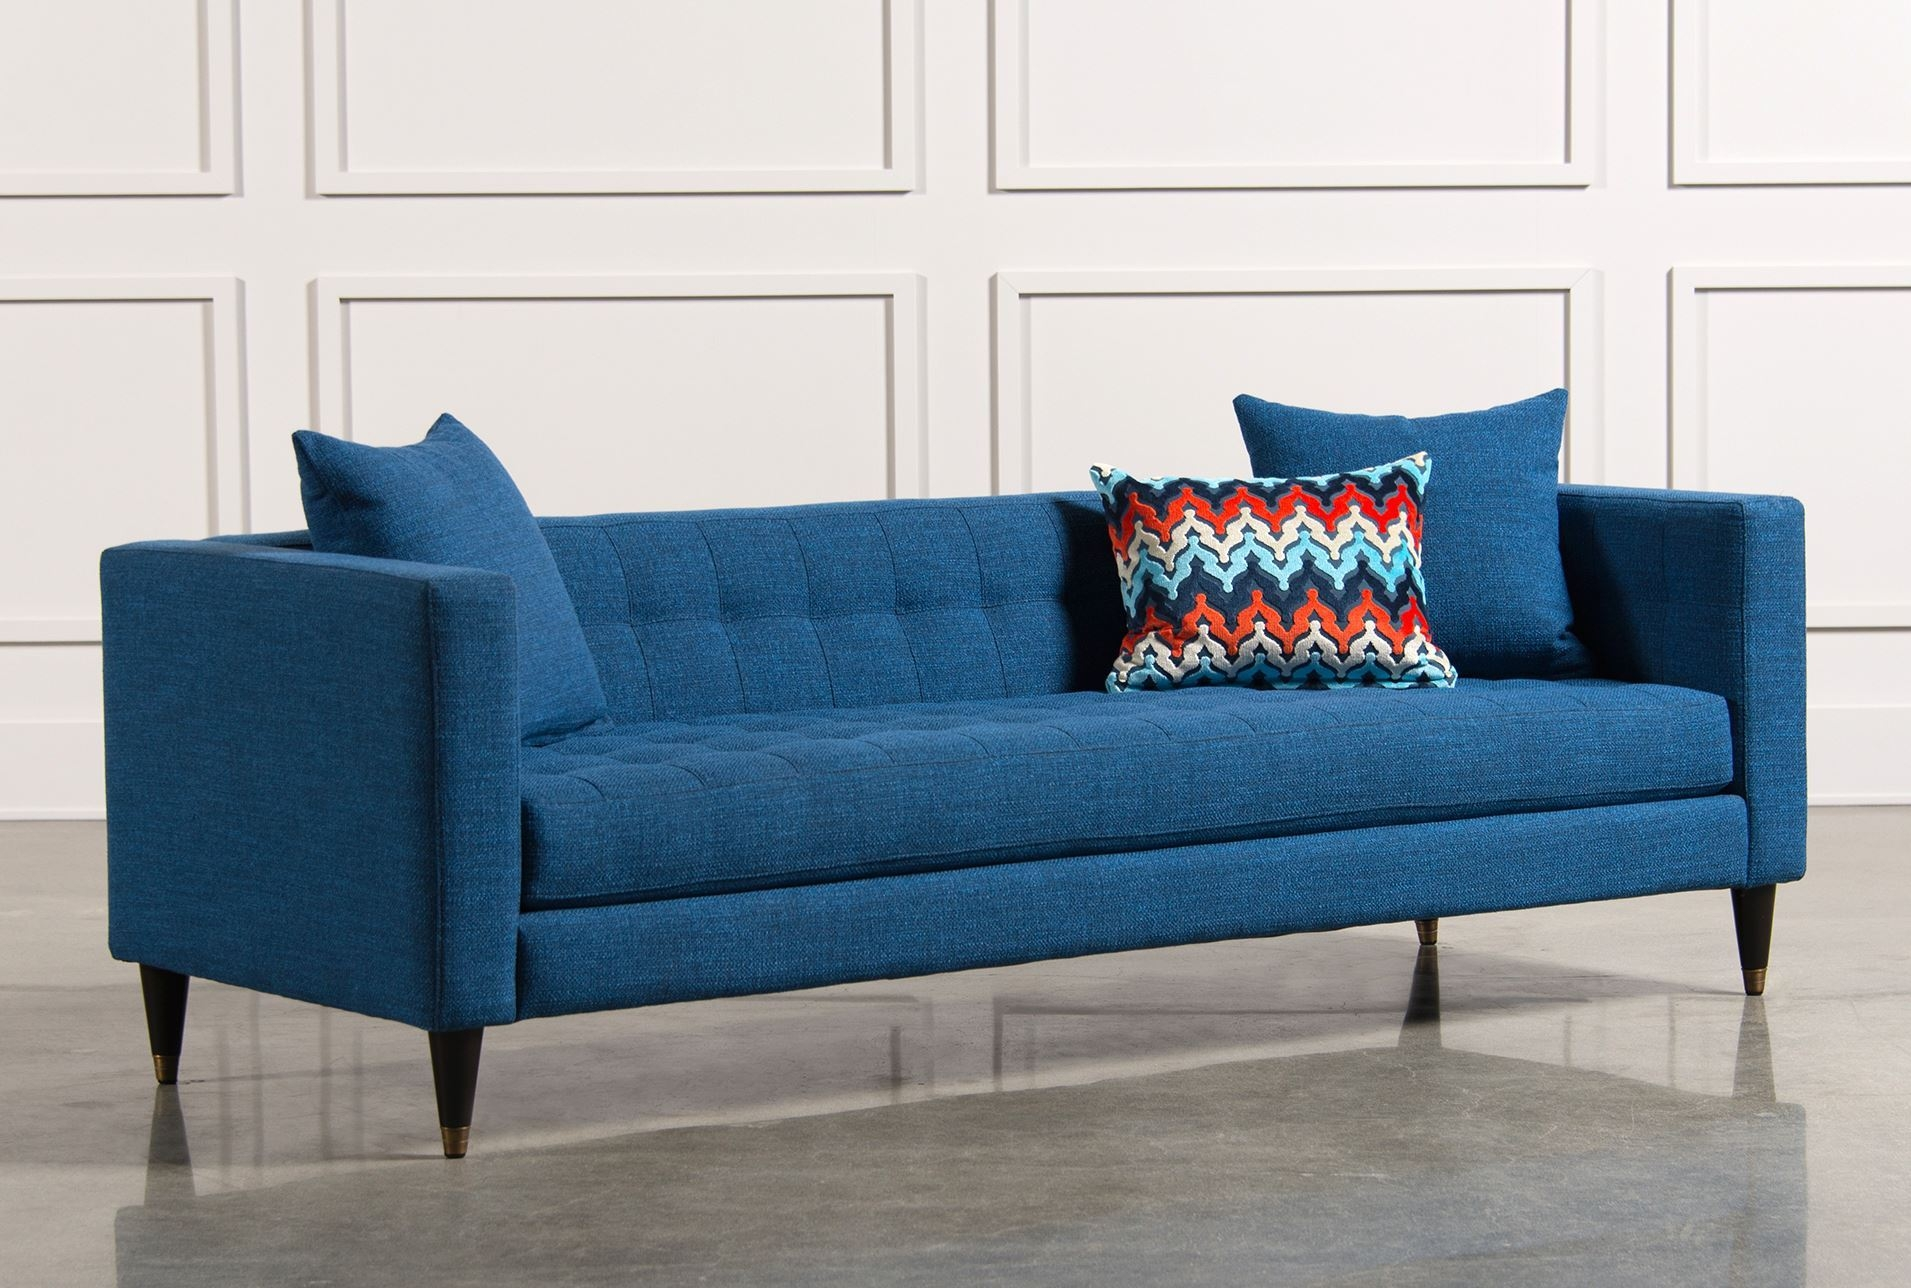 Inspirational Fabric Sofas 32 With Additional Office Sofa Ideas Regarding Fabric Sofas (Image 11 of 15)